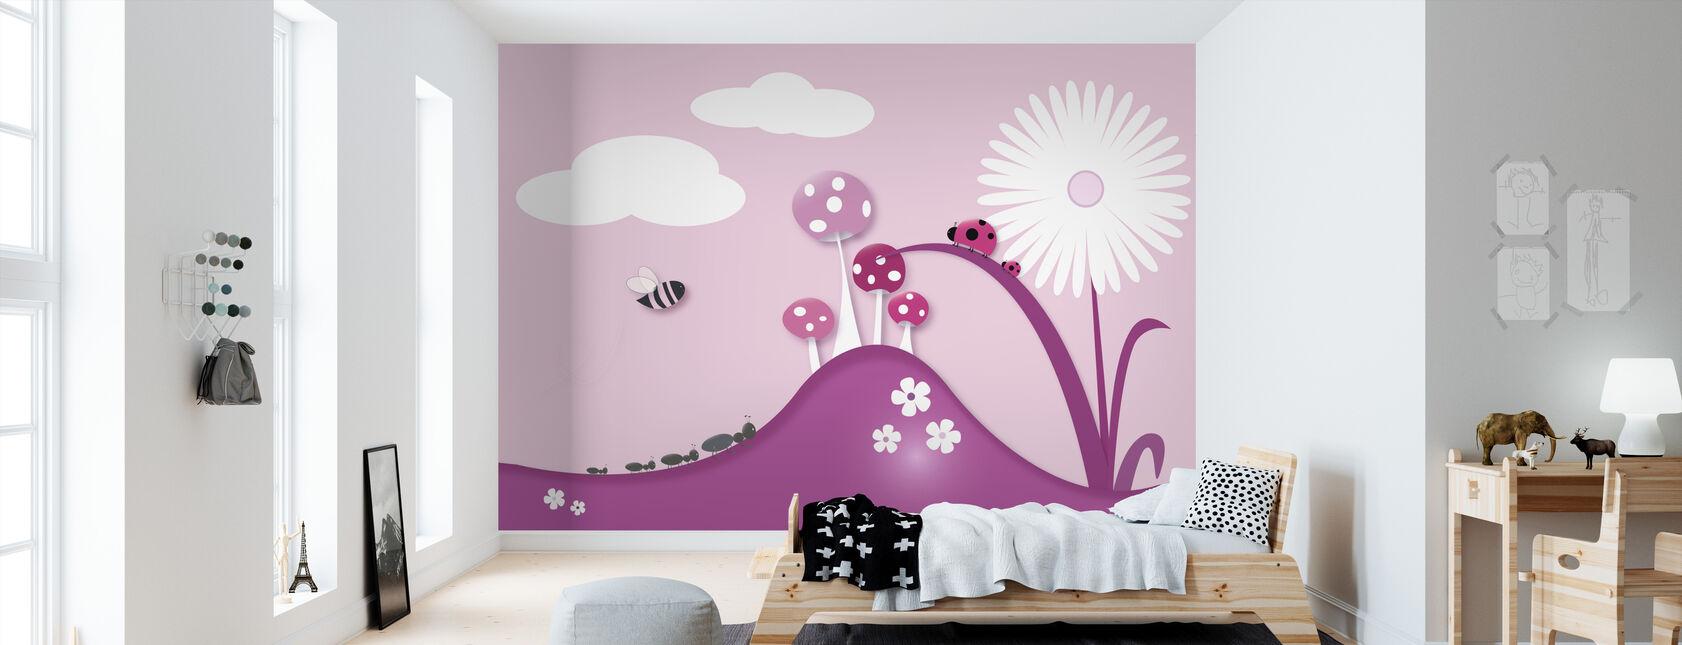 A Bugs World - Pink - Tapete - Kinderzimmer